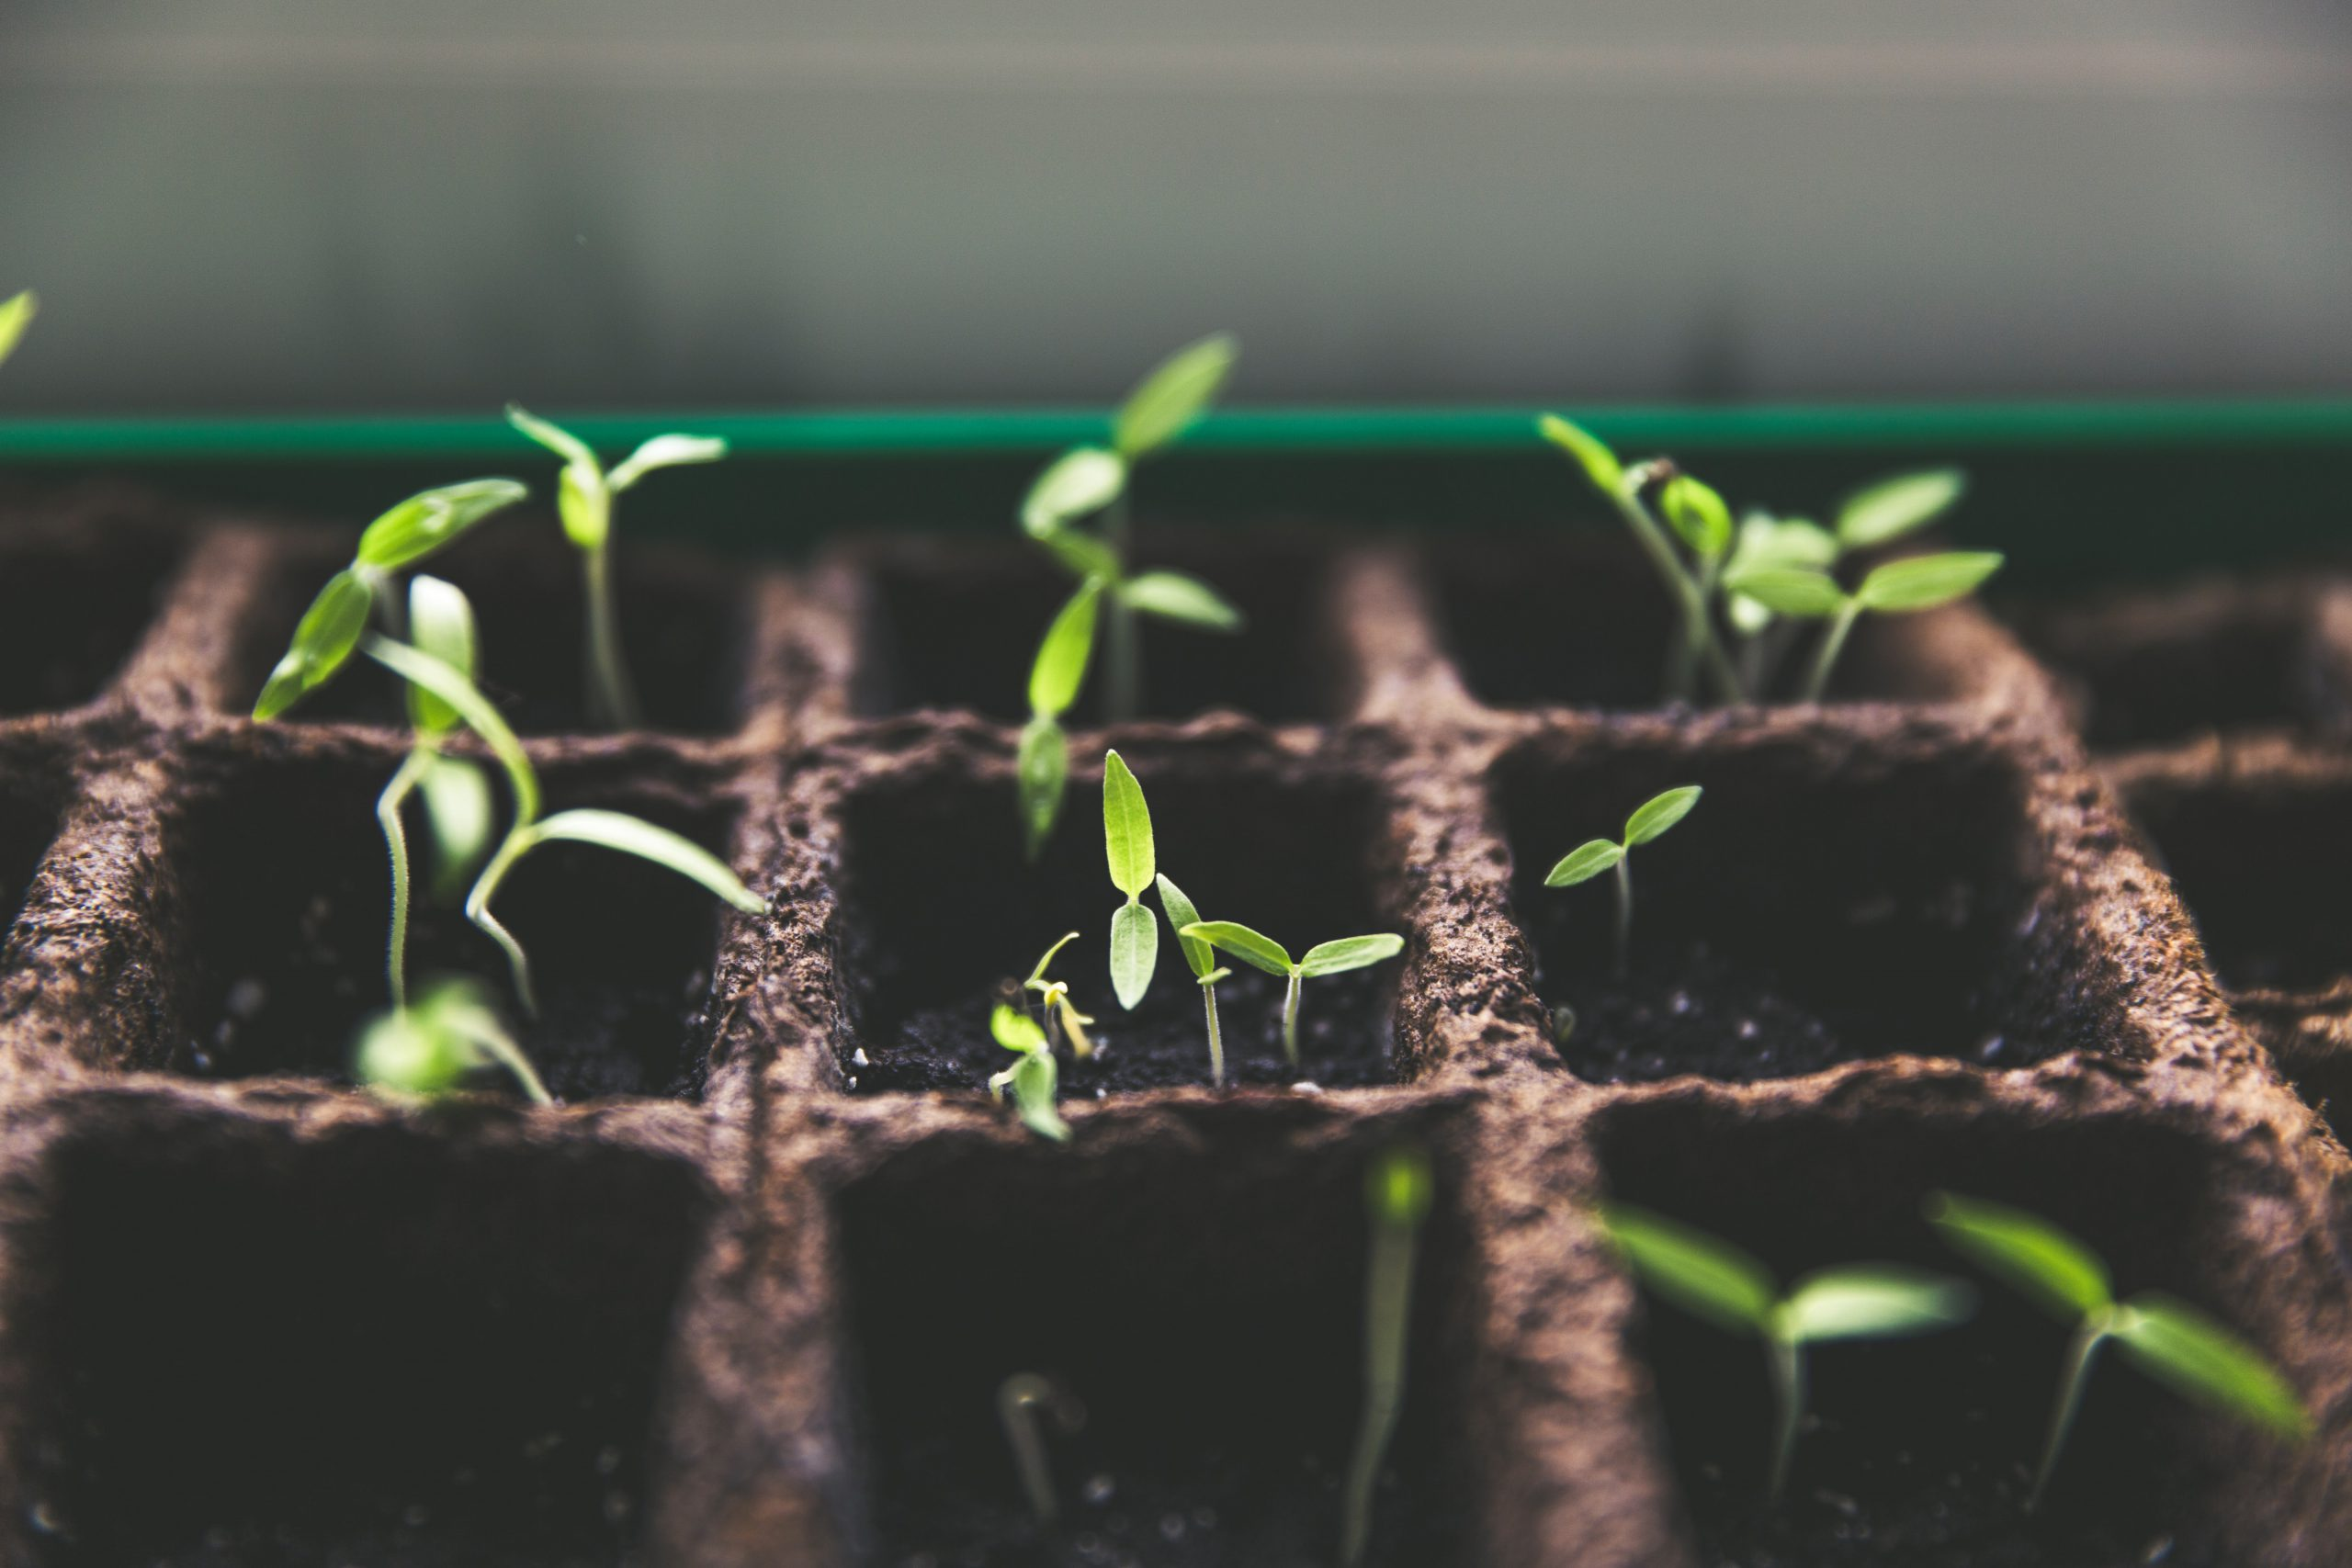 tomatenplantjes in kweekpotjes